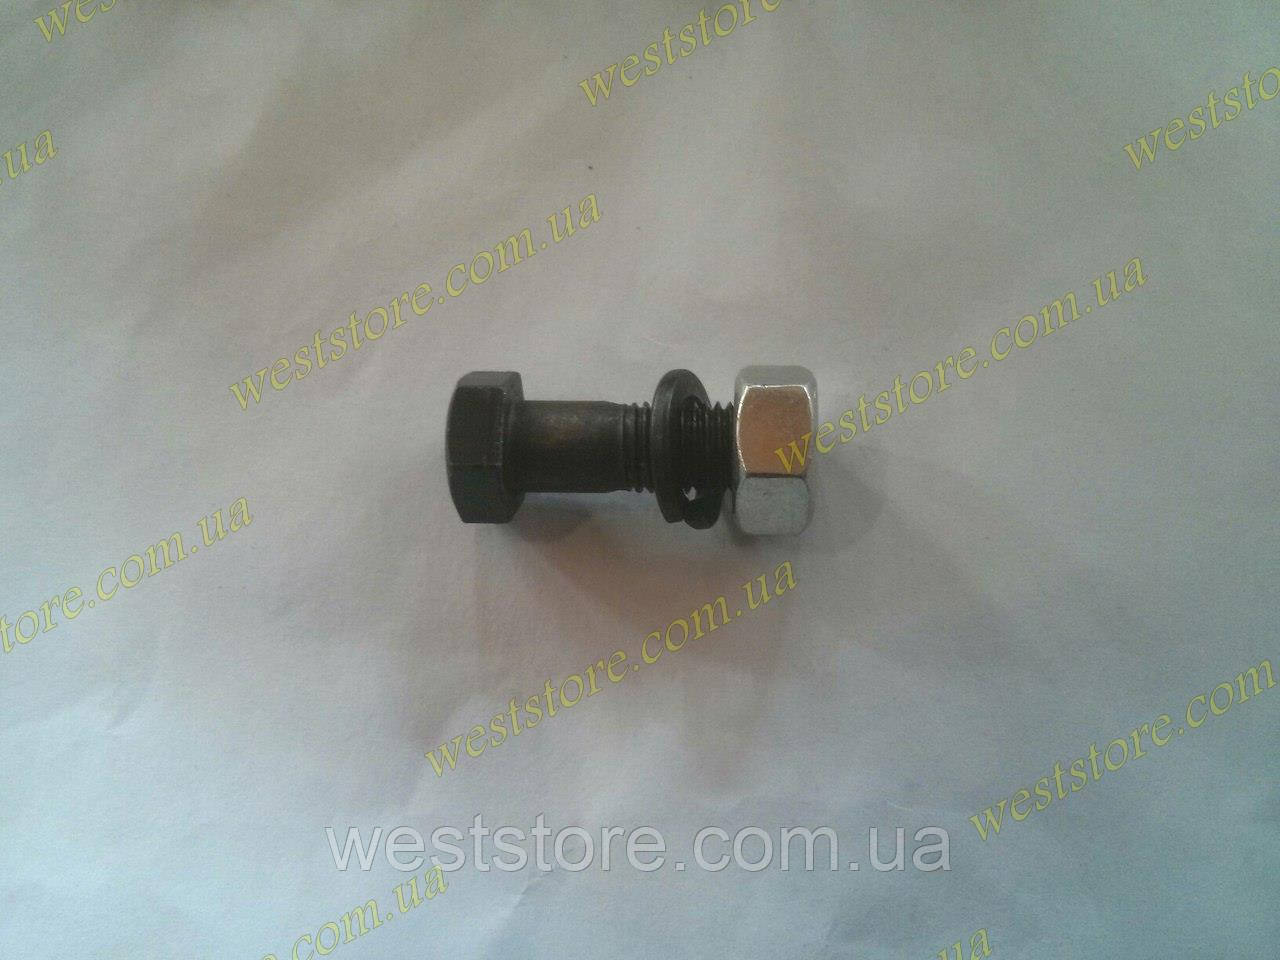 Болт кардана Москвич 412,2140 в сборе (болт+гайка+гровер) (м8х22х1) Россия